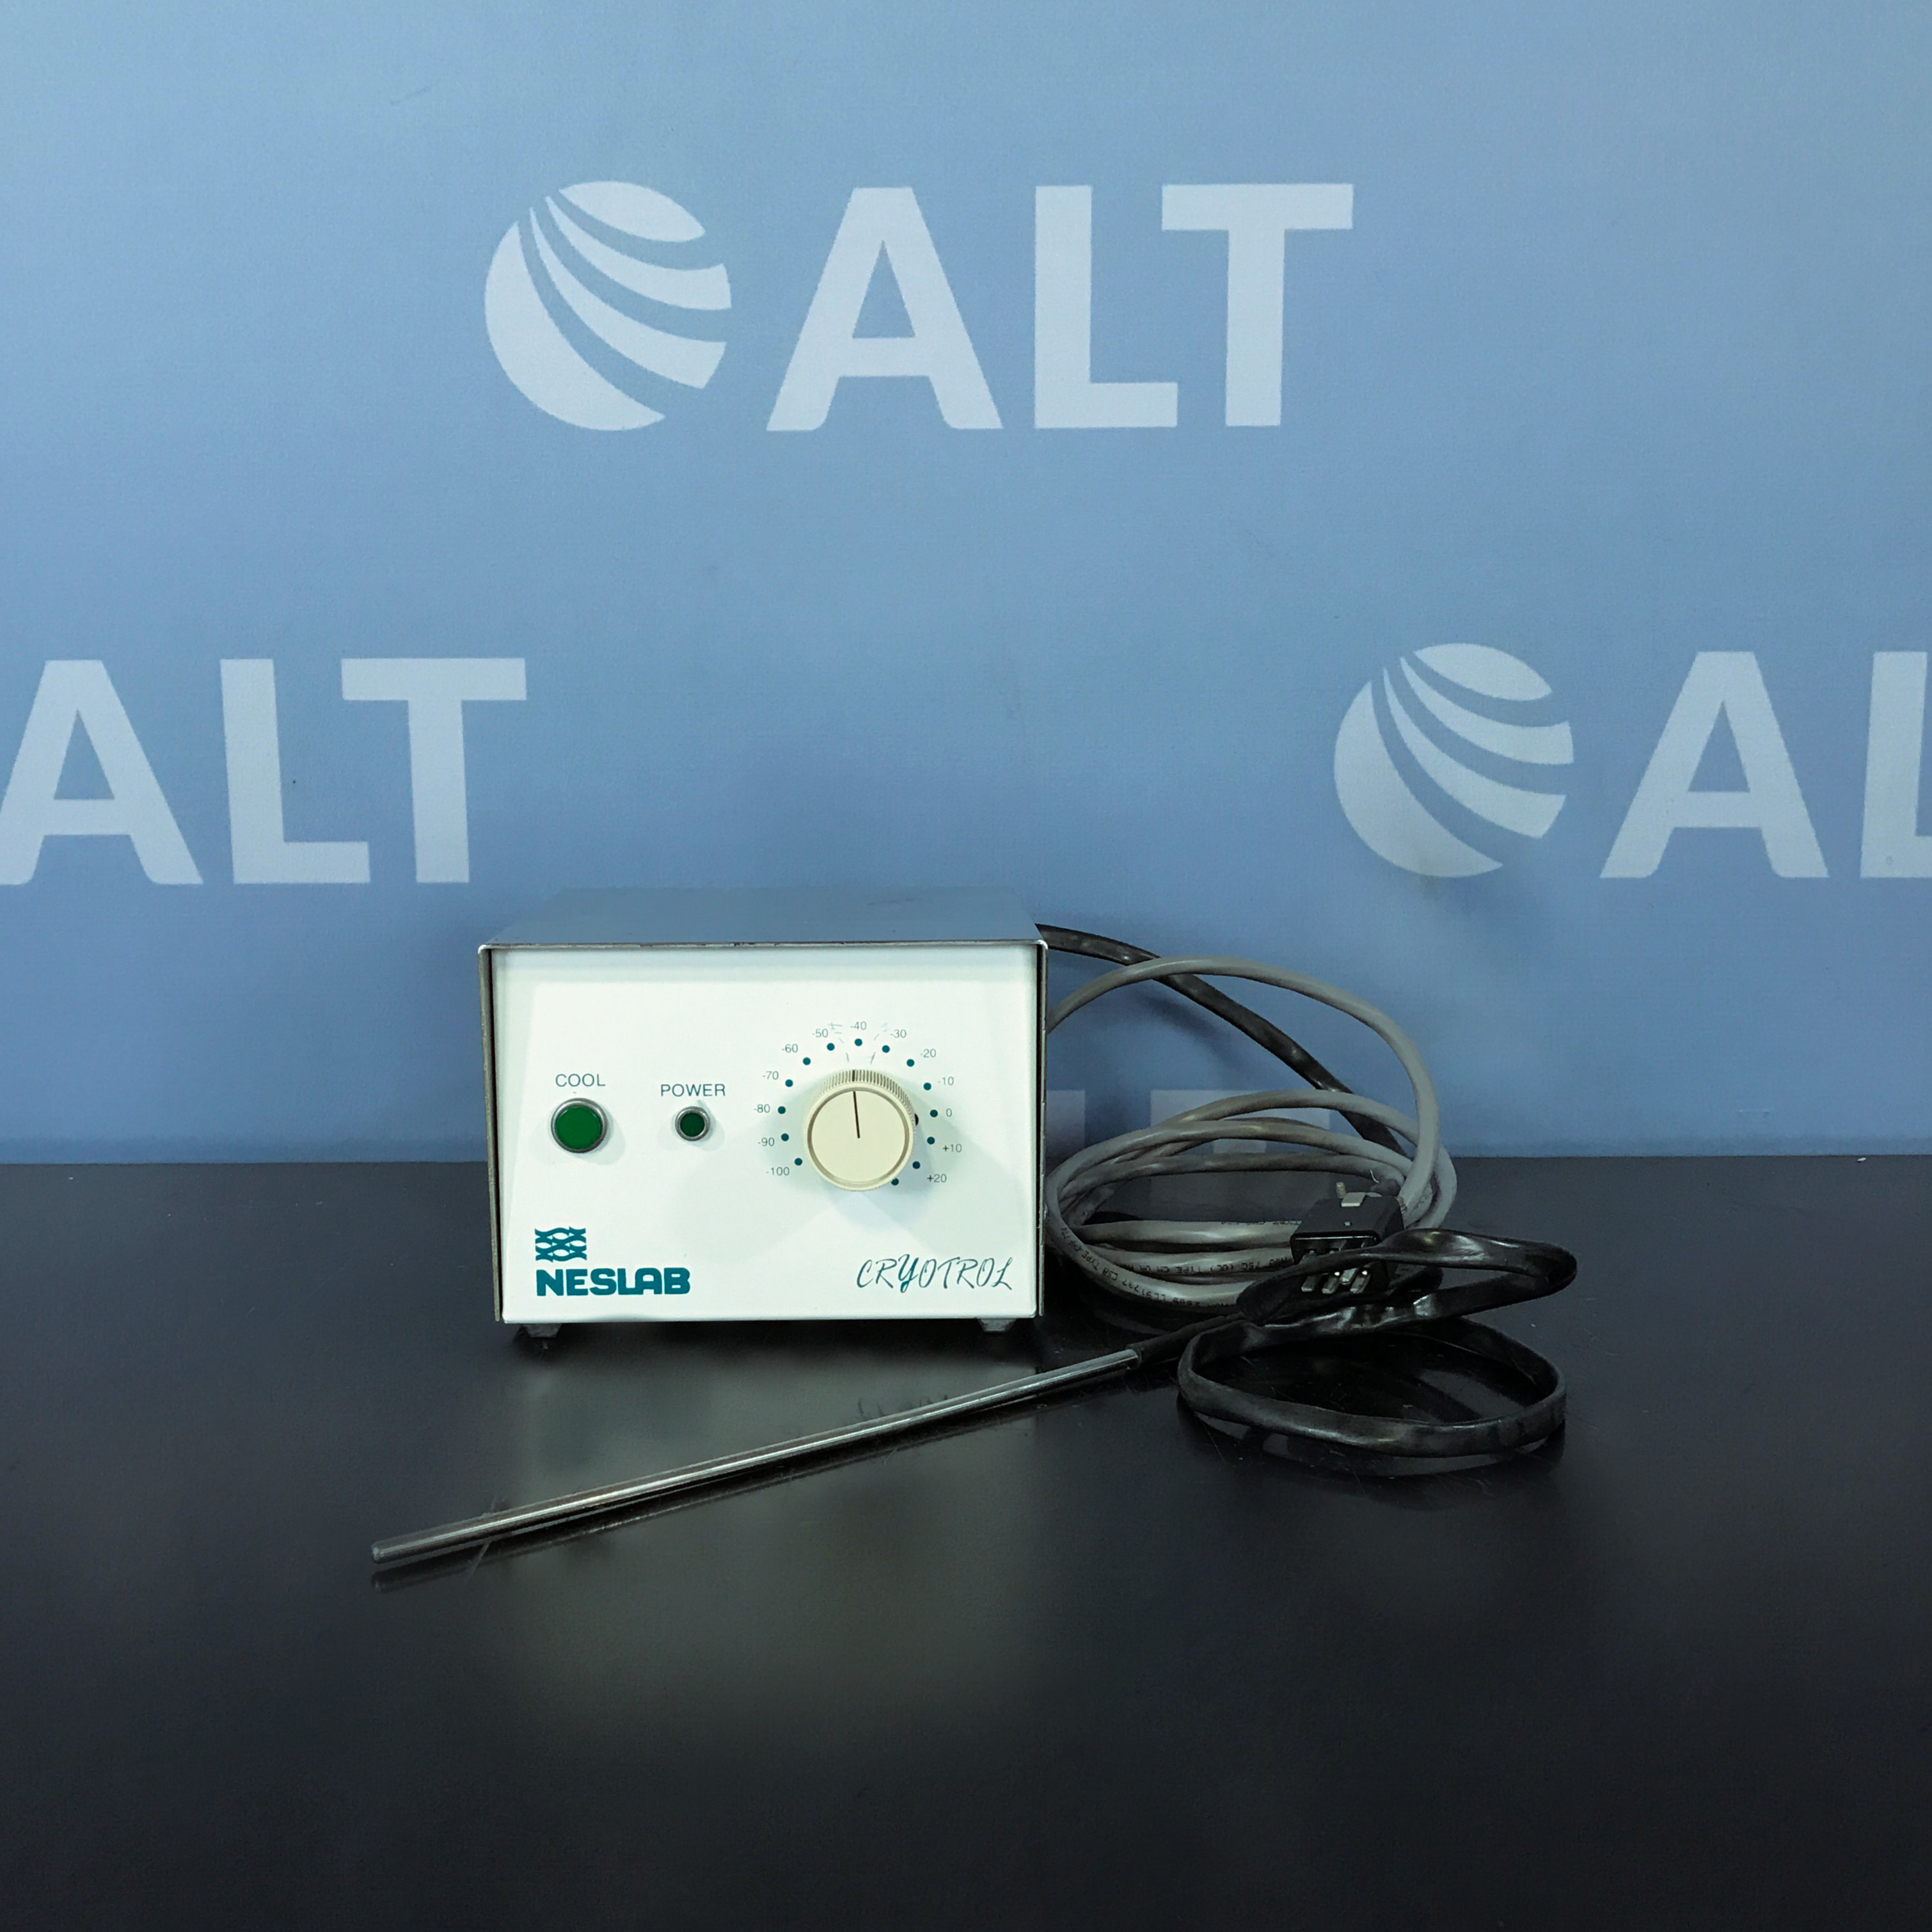 Cryotrol Temperature Controller Name